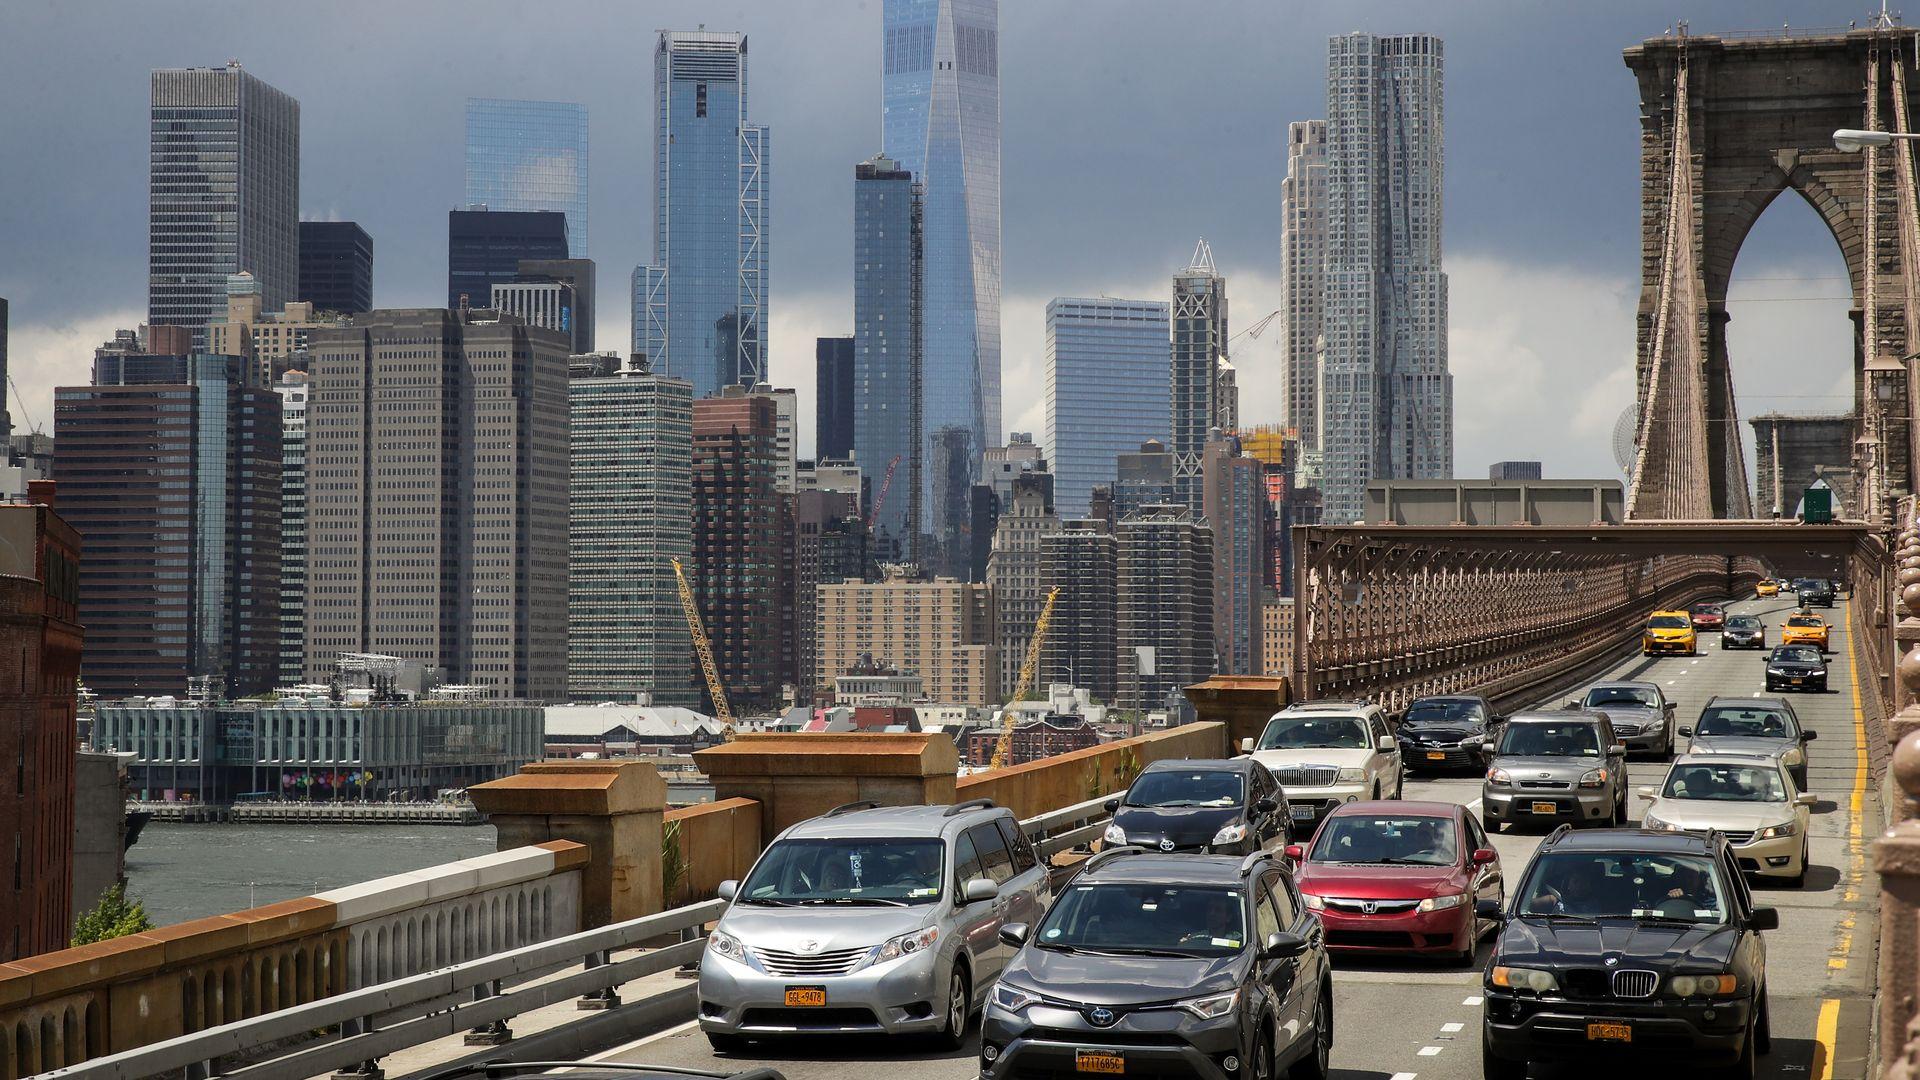 view of lower Manhattan and traffic on Brooklyn Bridge